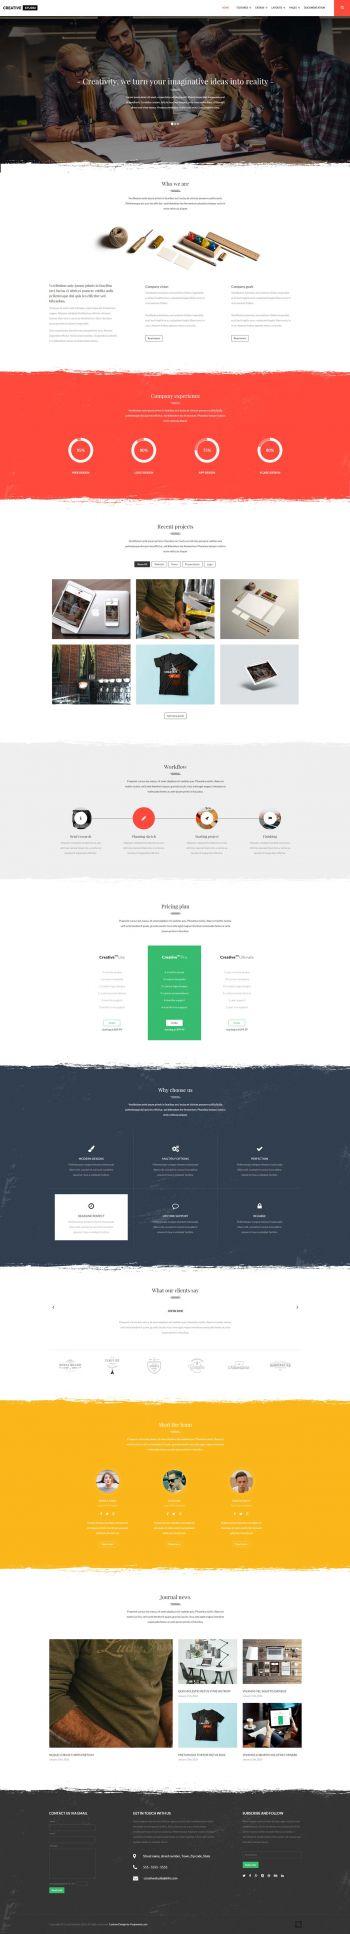 Creativestudio - Multipurpose Joomla Template